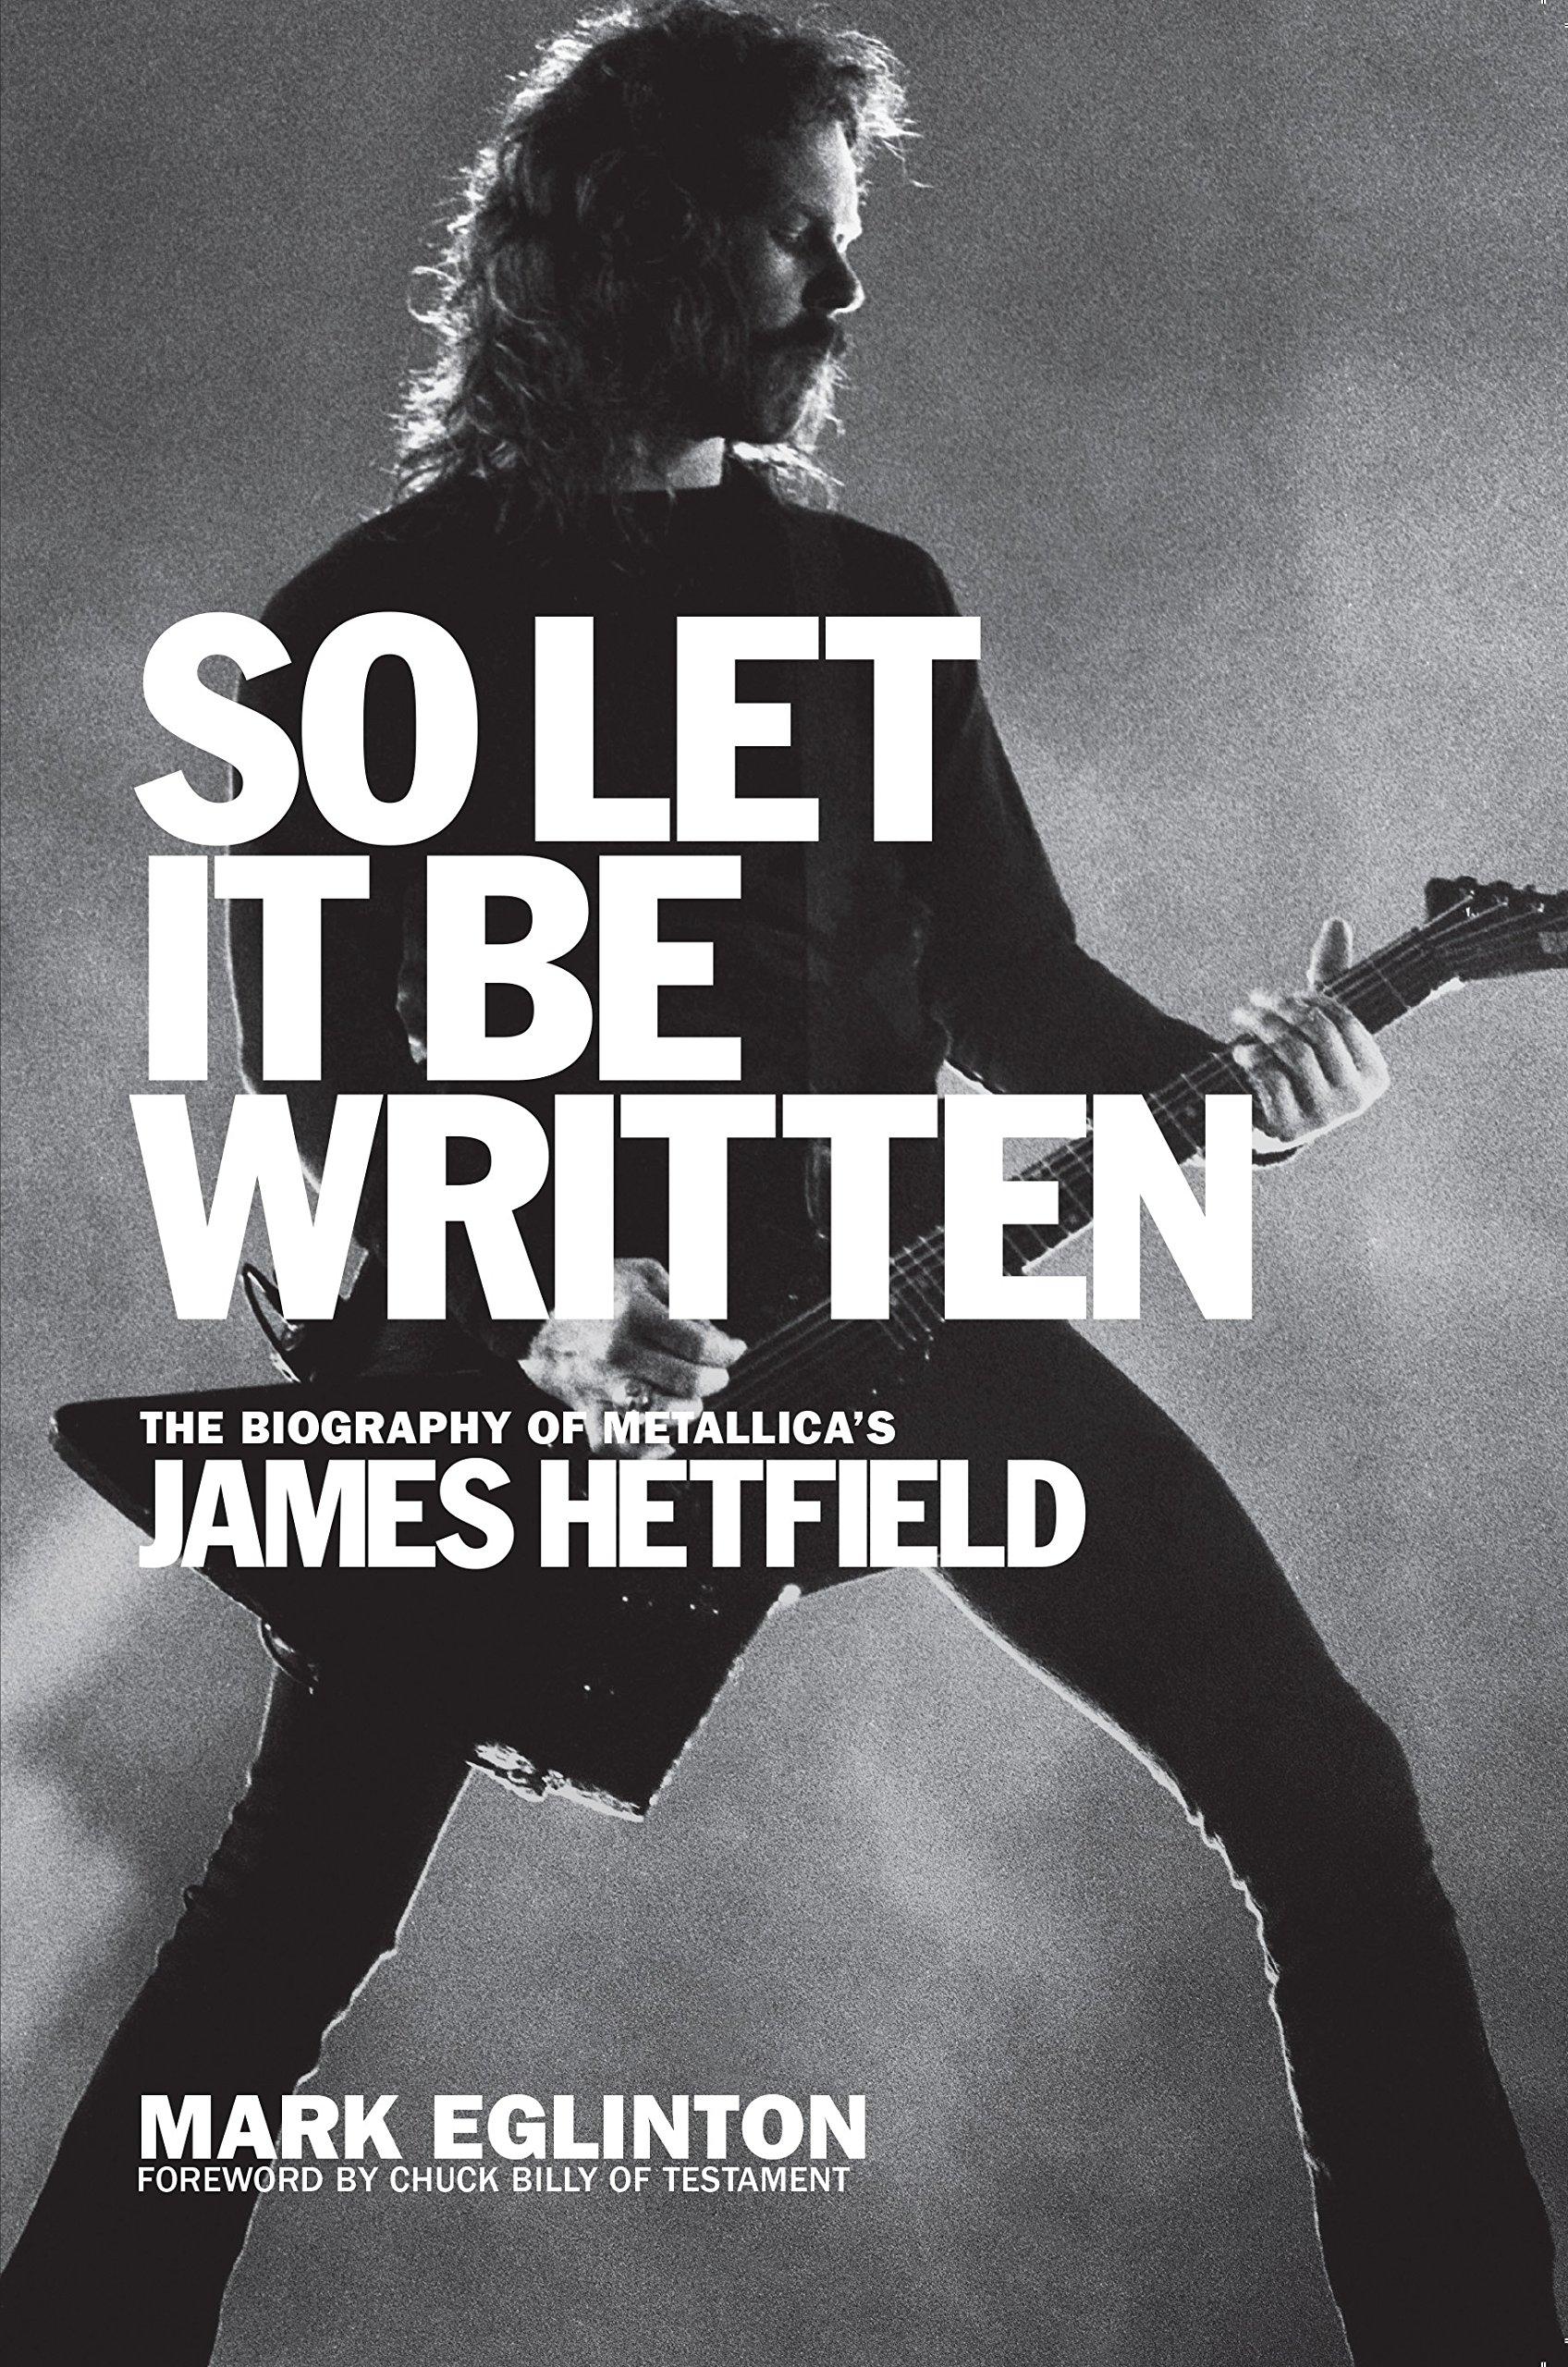 So Let It Be Written: The Biography of Metallicas James Hetfield: Amazon.es: Mark Eglinton, Chuck Billy: Libros en idiomas extranjeros